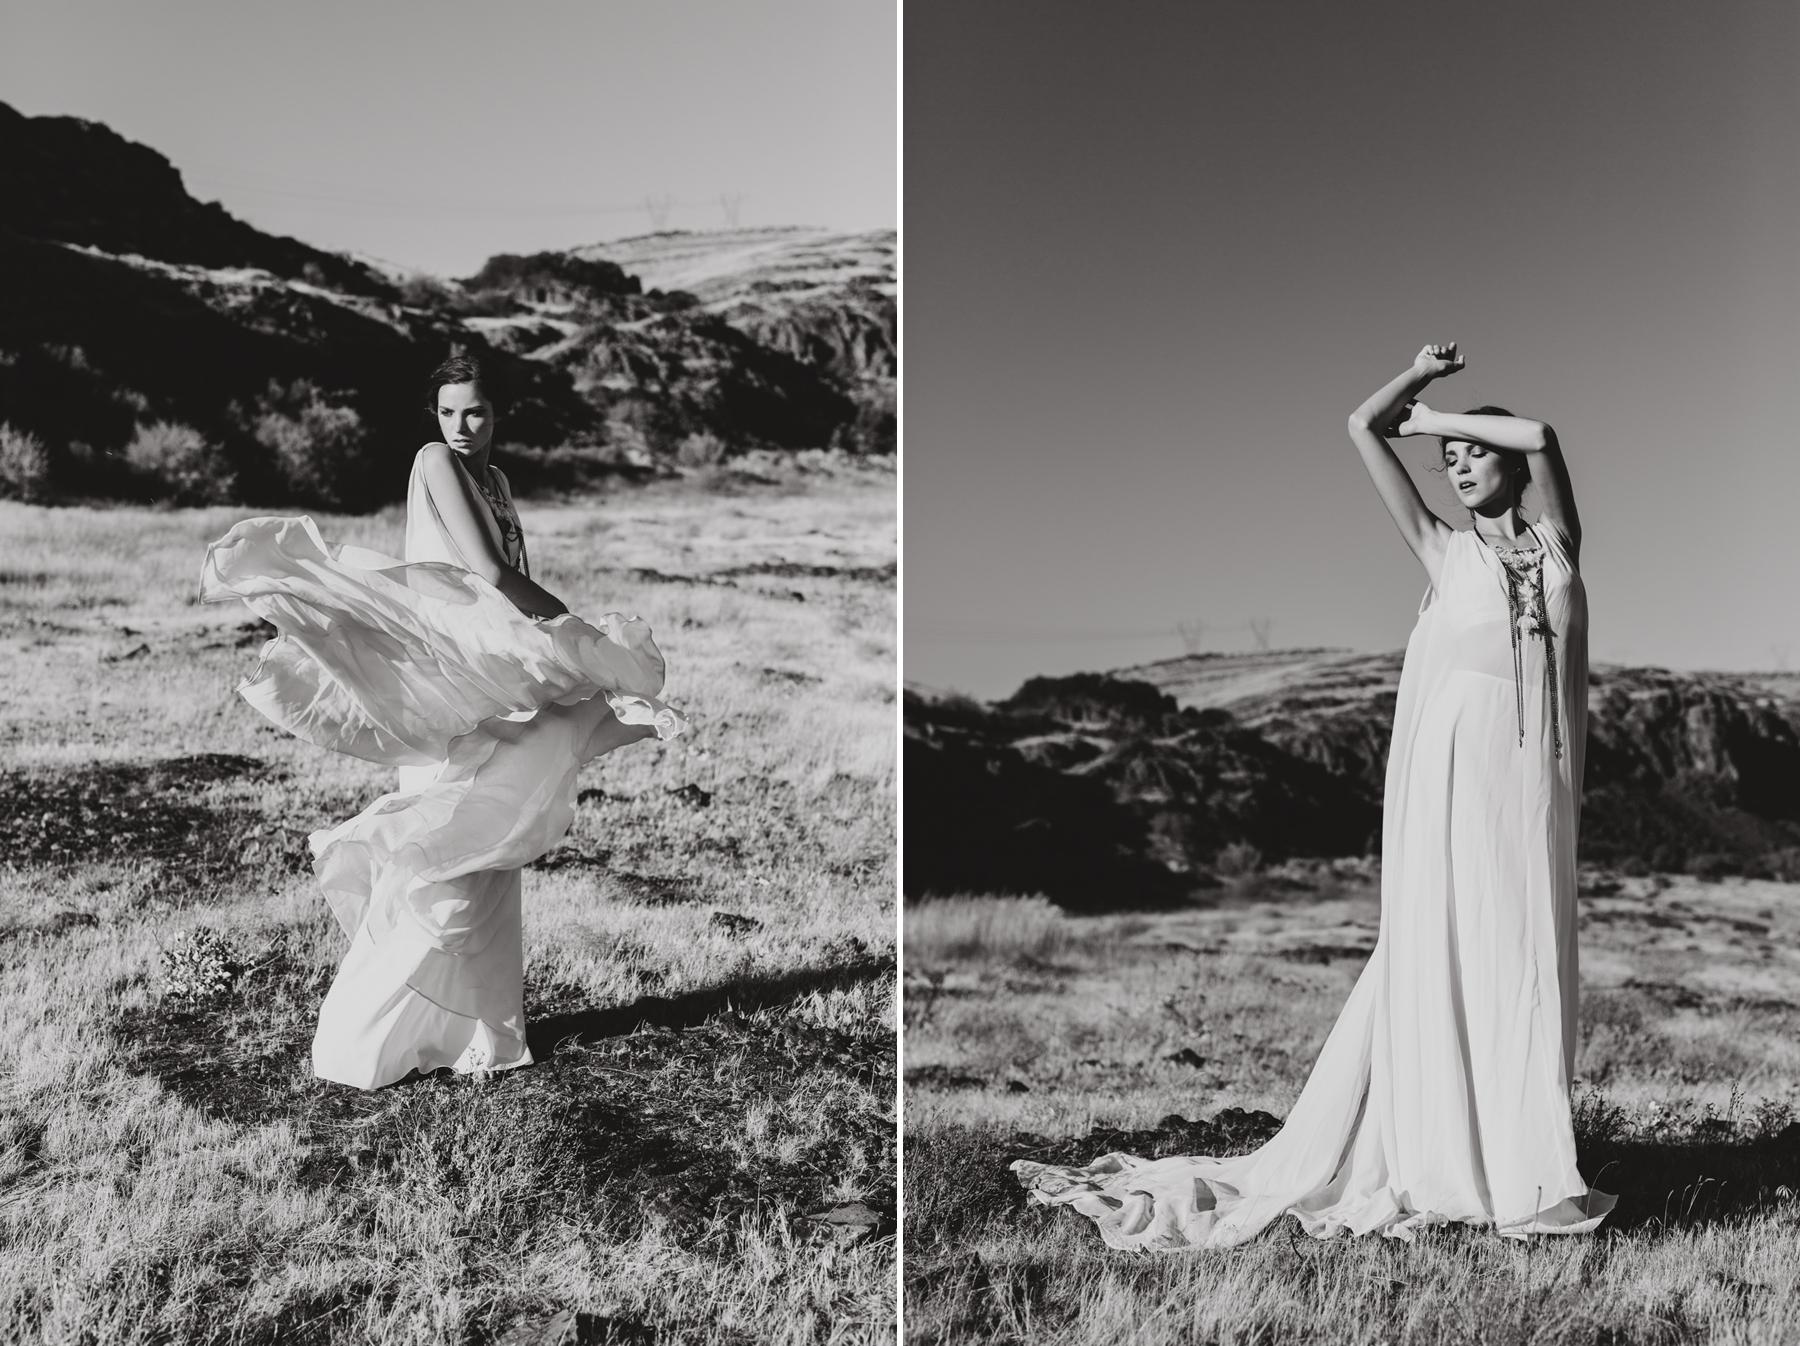 The new wedding dress collection from Portland designer Elizabeth Dye